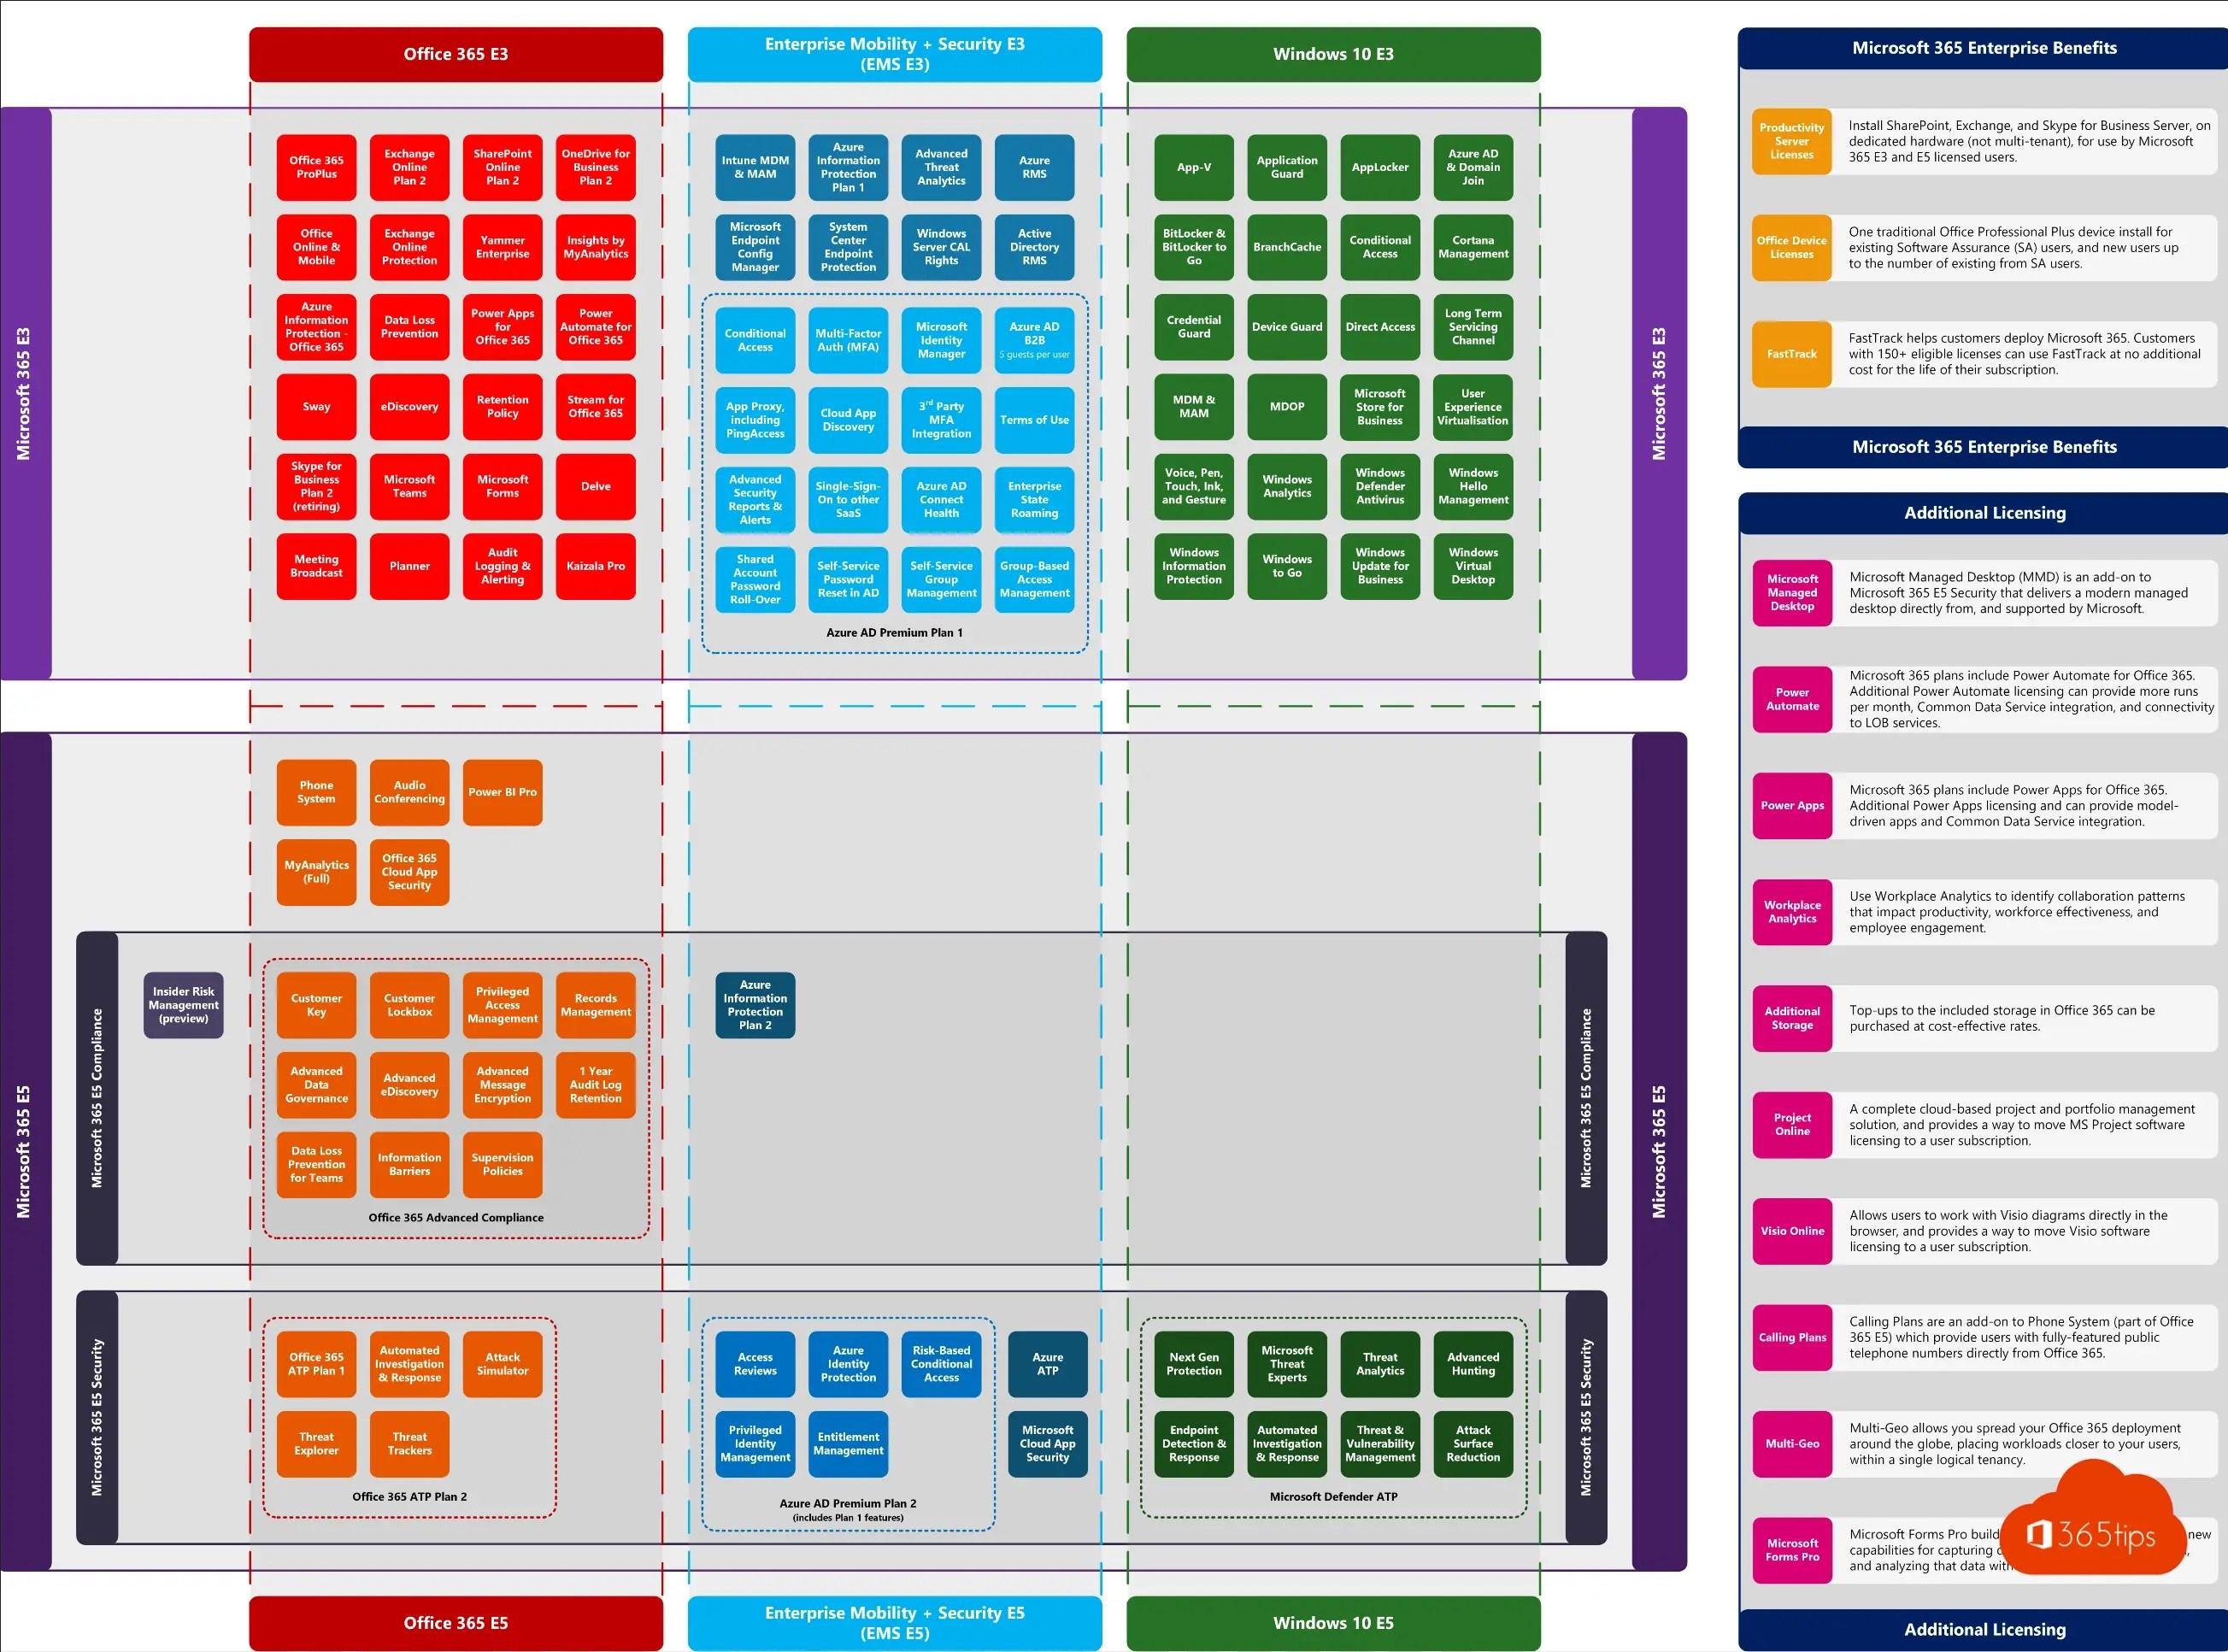 Microsoft 365 feature vergelijking in detail